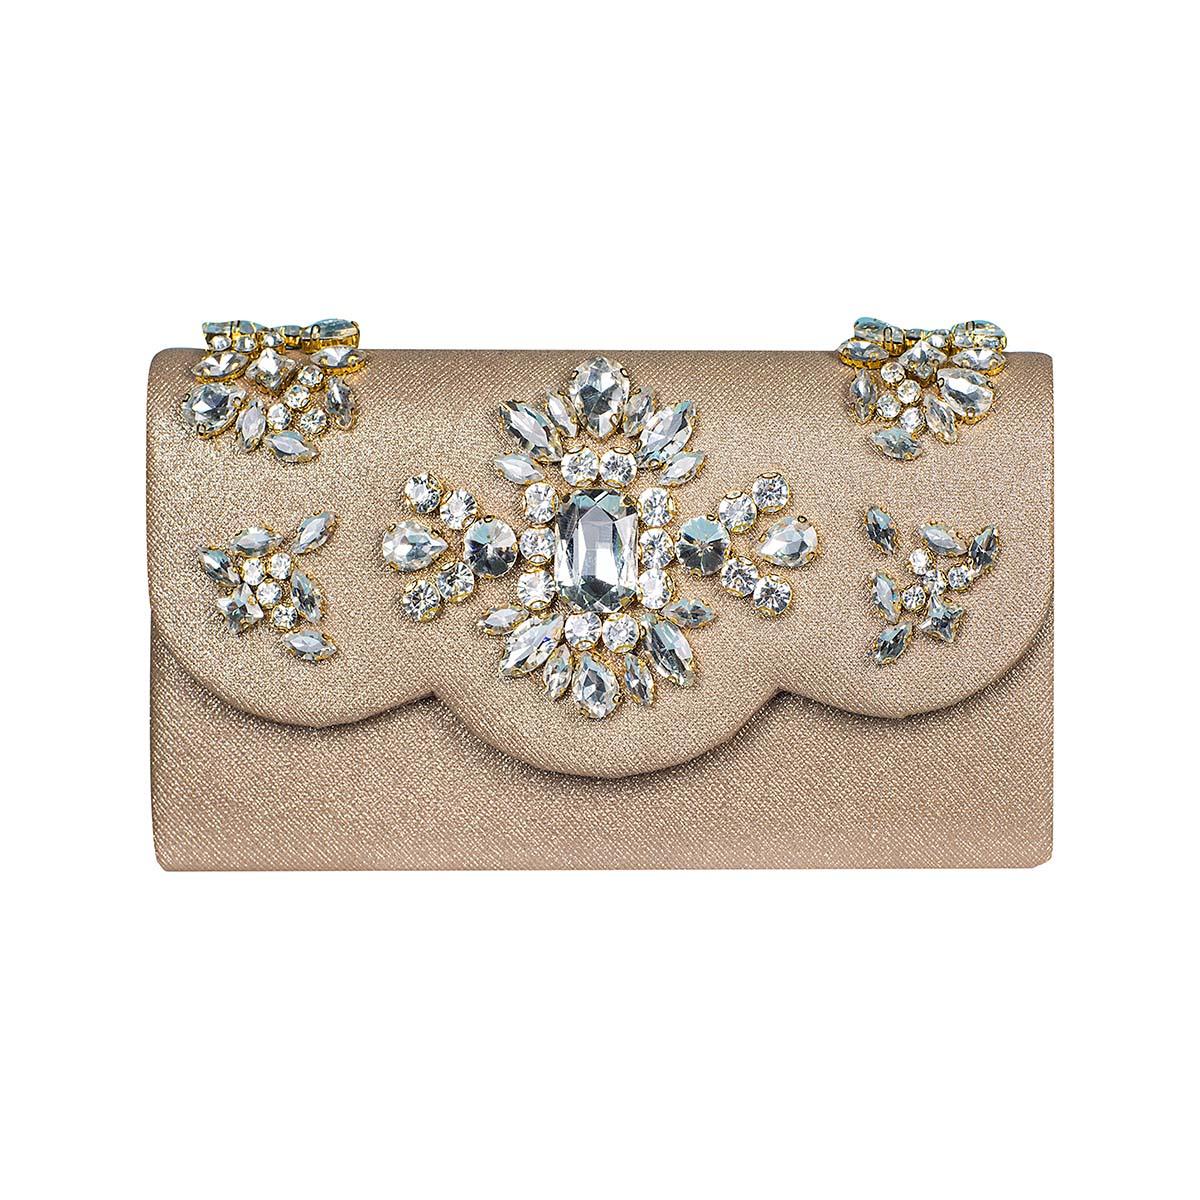 Teria Yabar - Bolso mini dorado con cristal